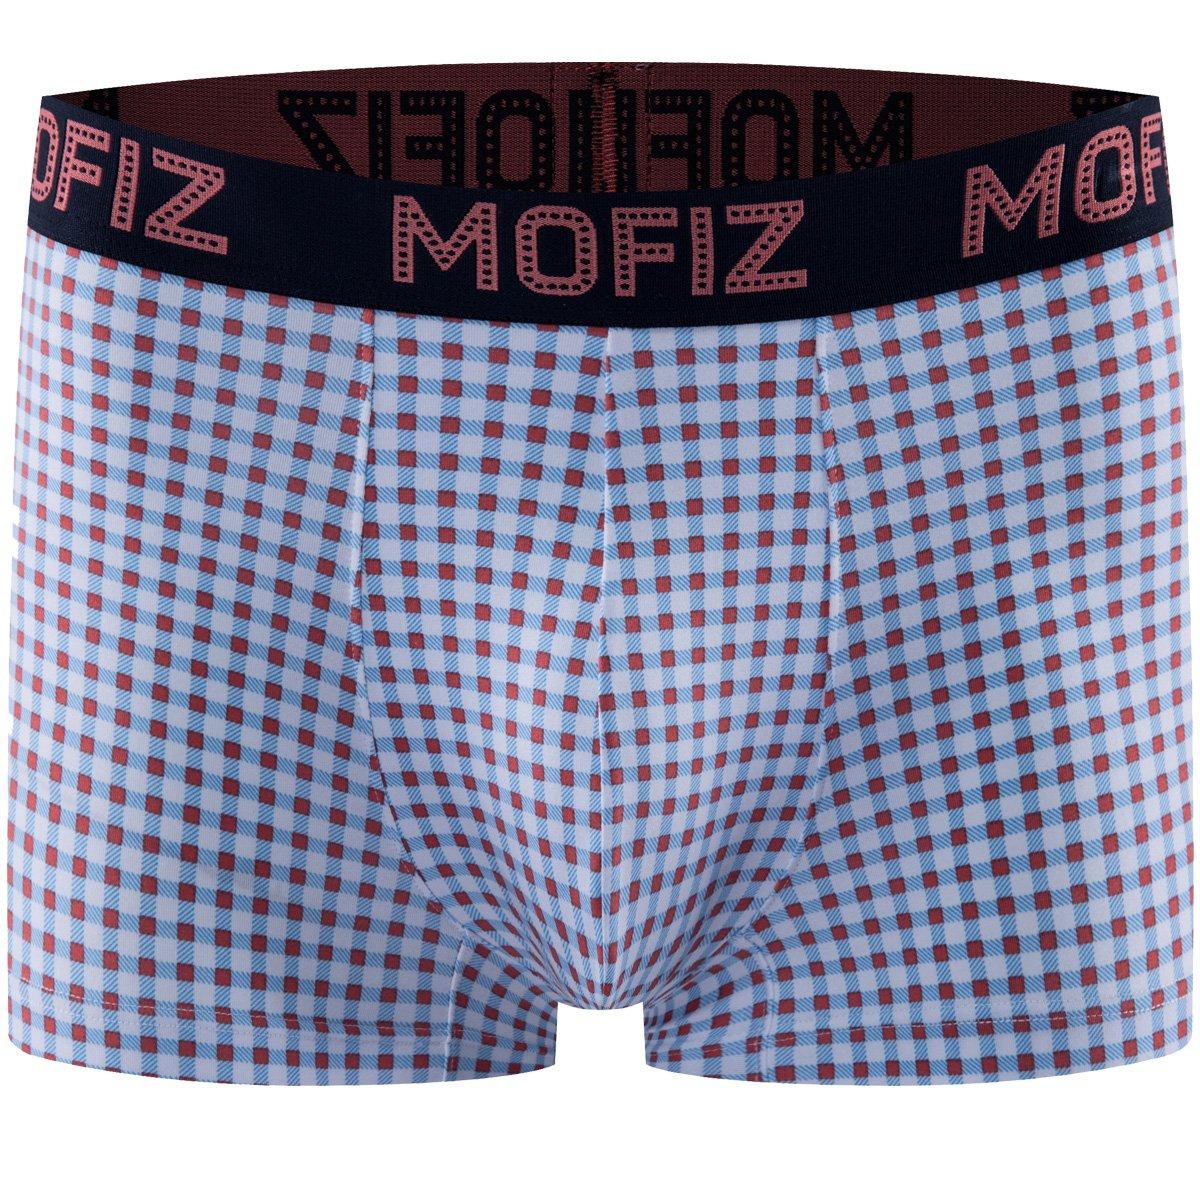 MoFiz Men's Underwear Performance Ultra Soft Modal Cotton Plaid Boxer Briefs